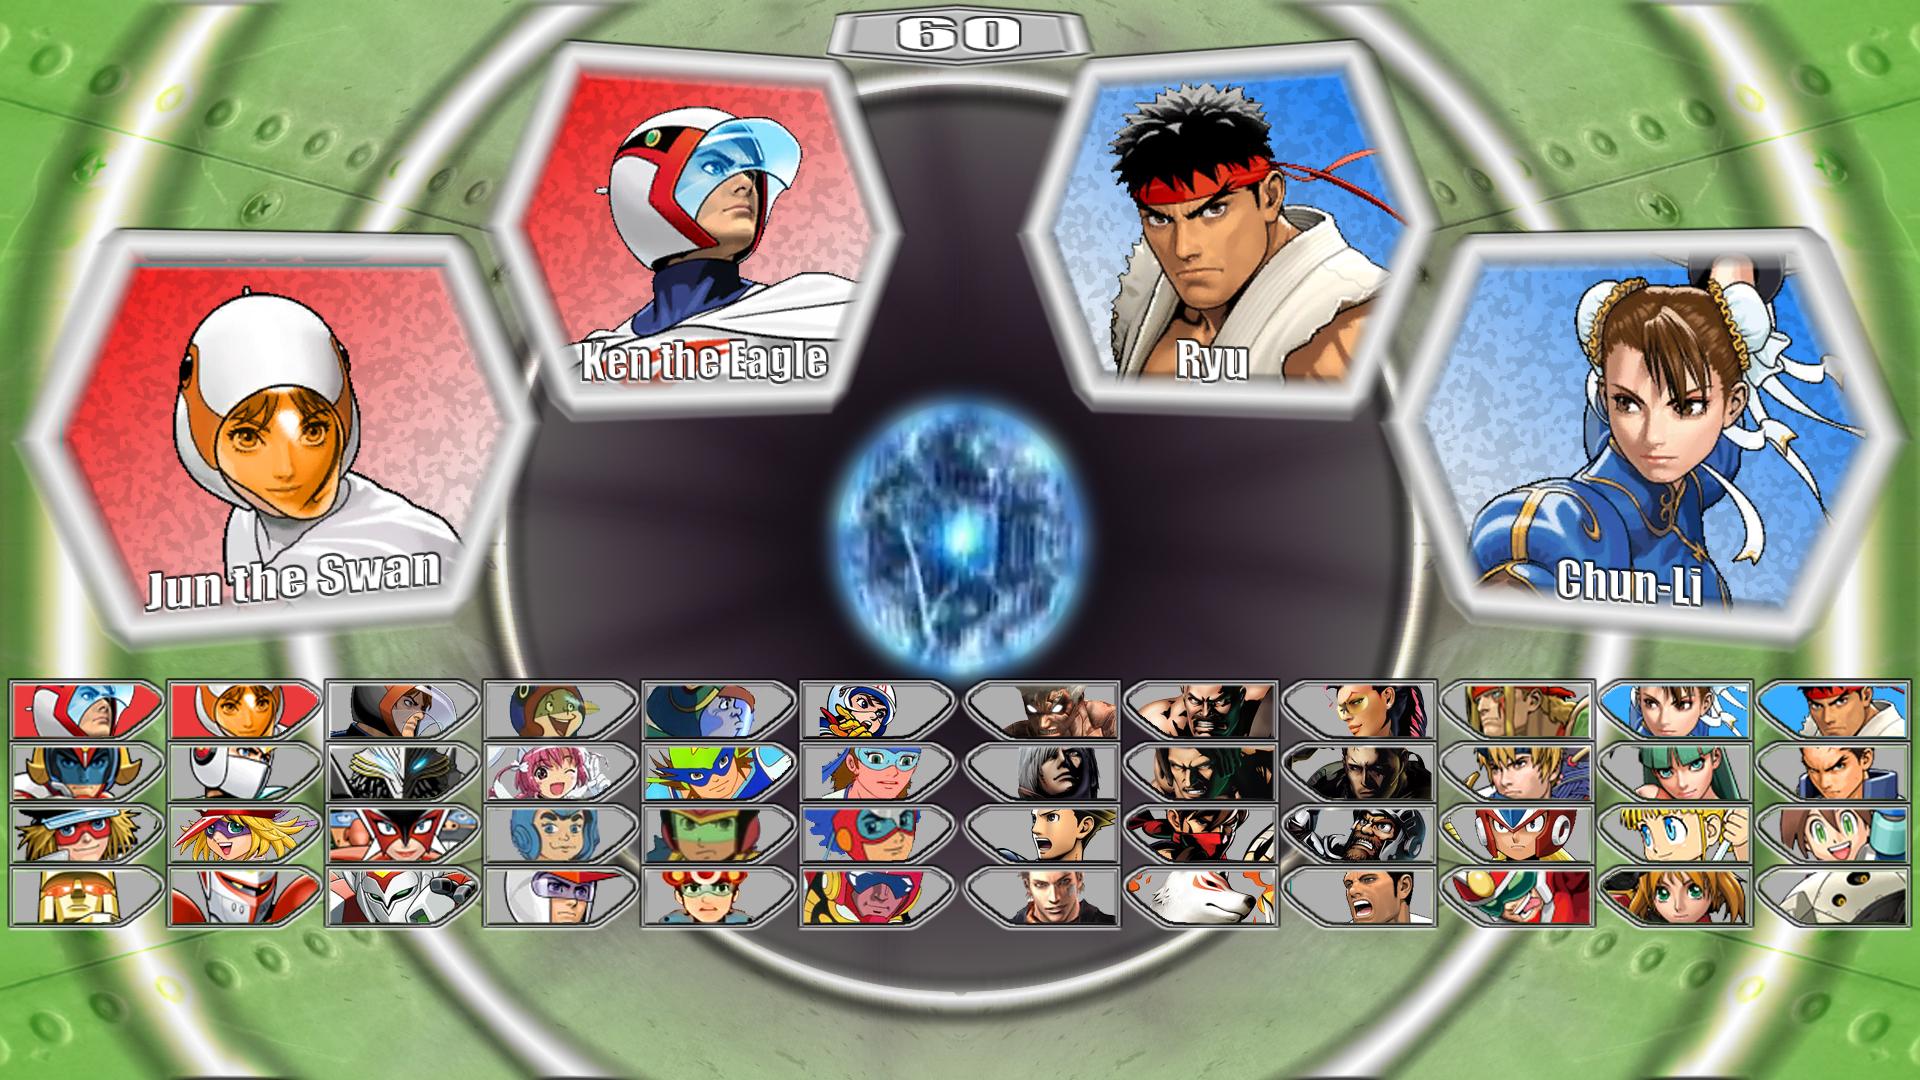 Tatsunoko vs Capcom 2 select screen by MrJechgo on DeviantArt